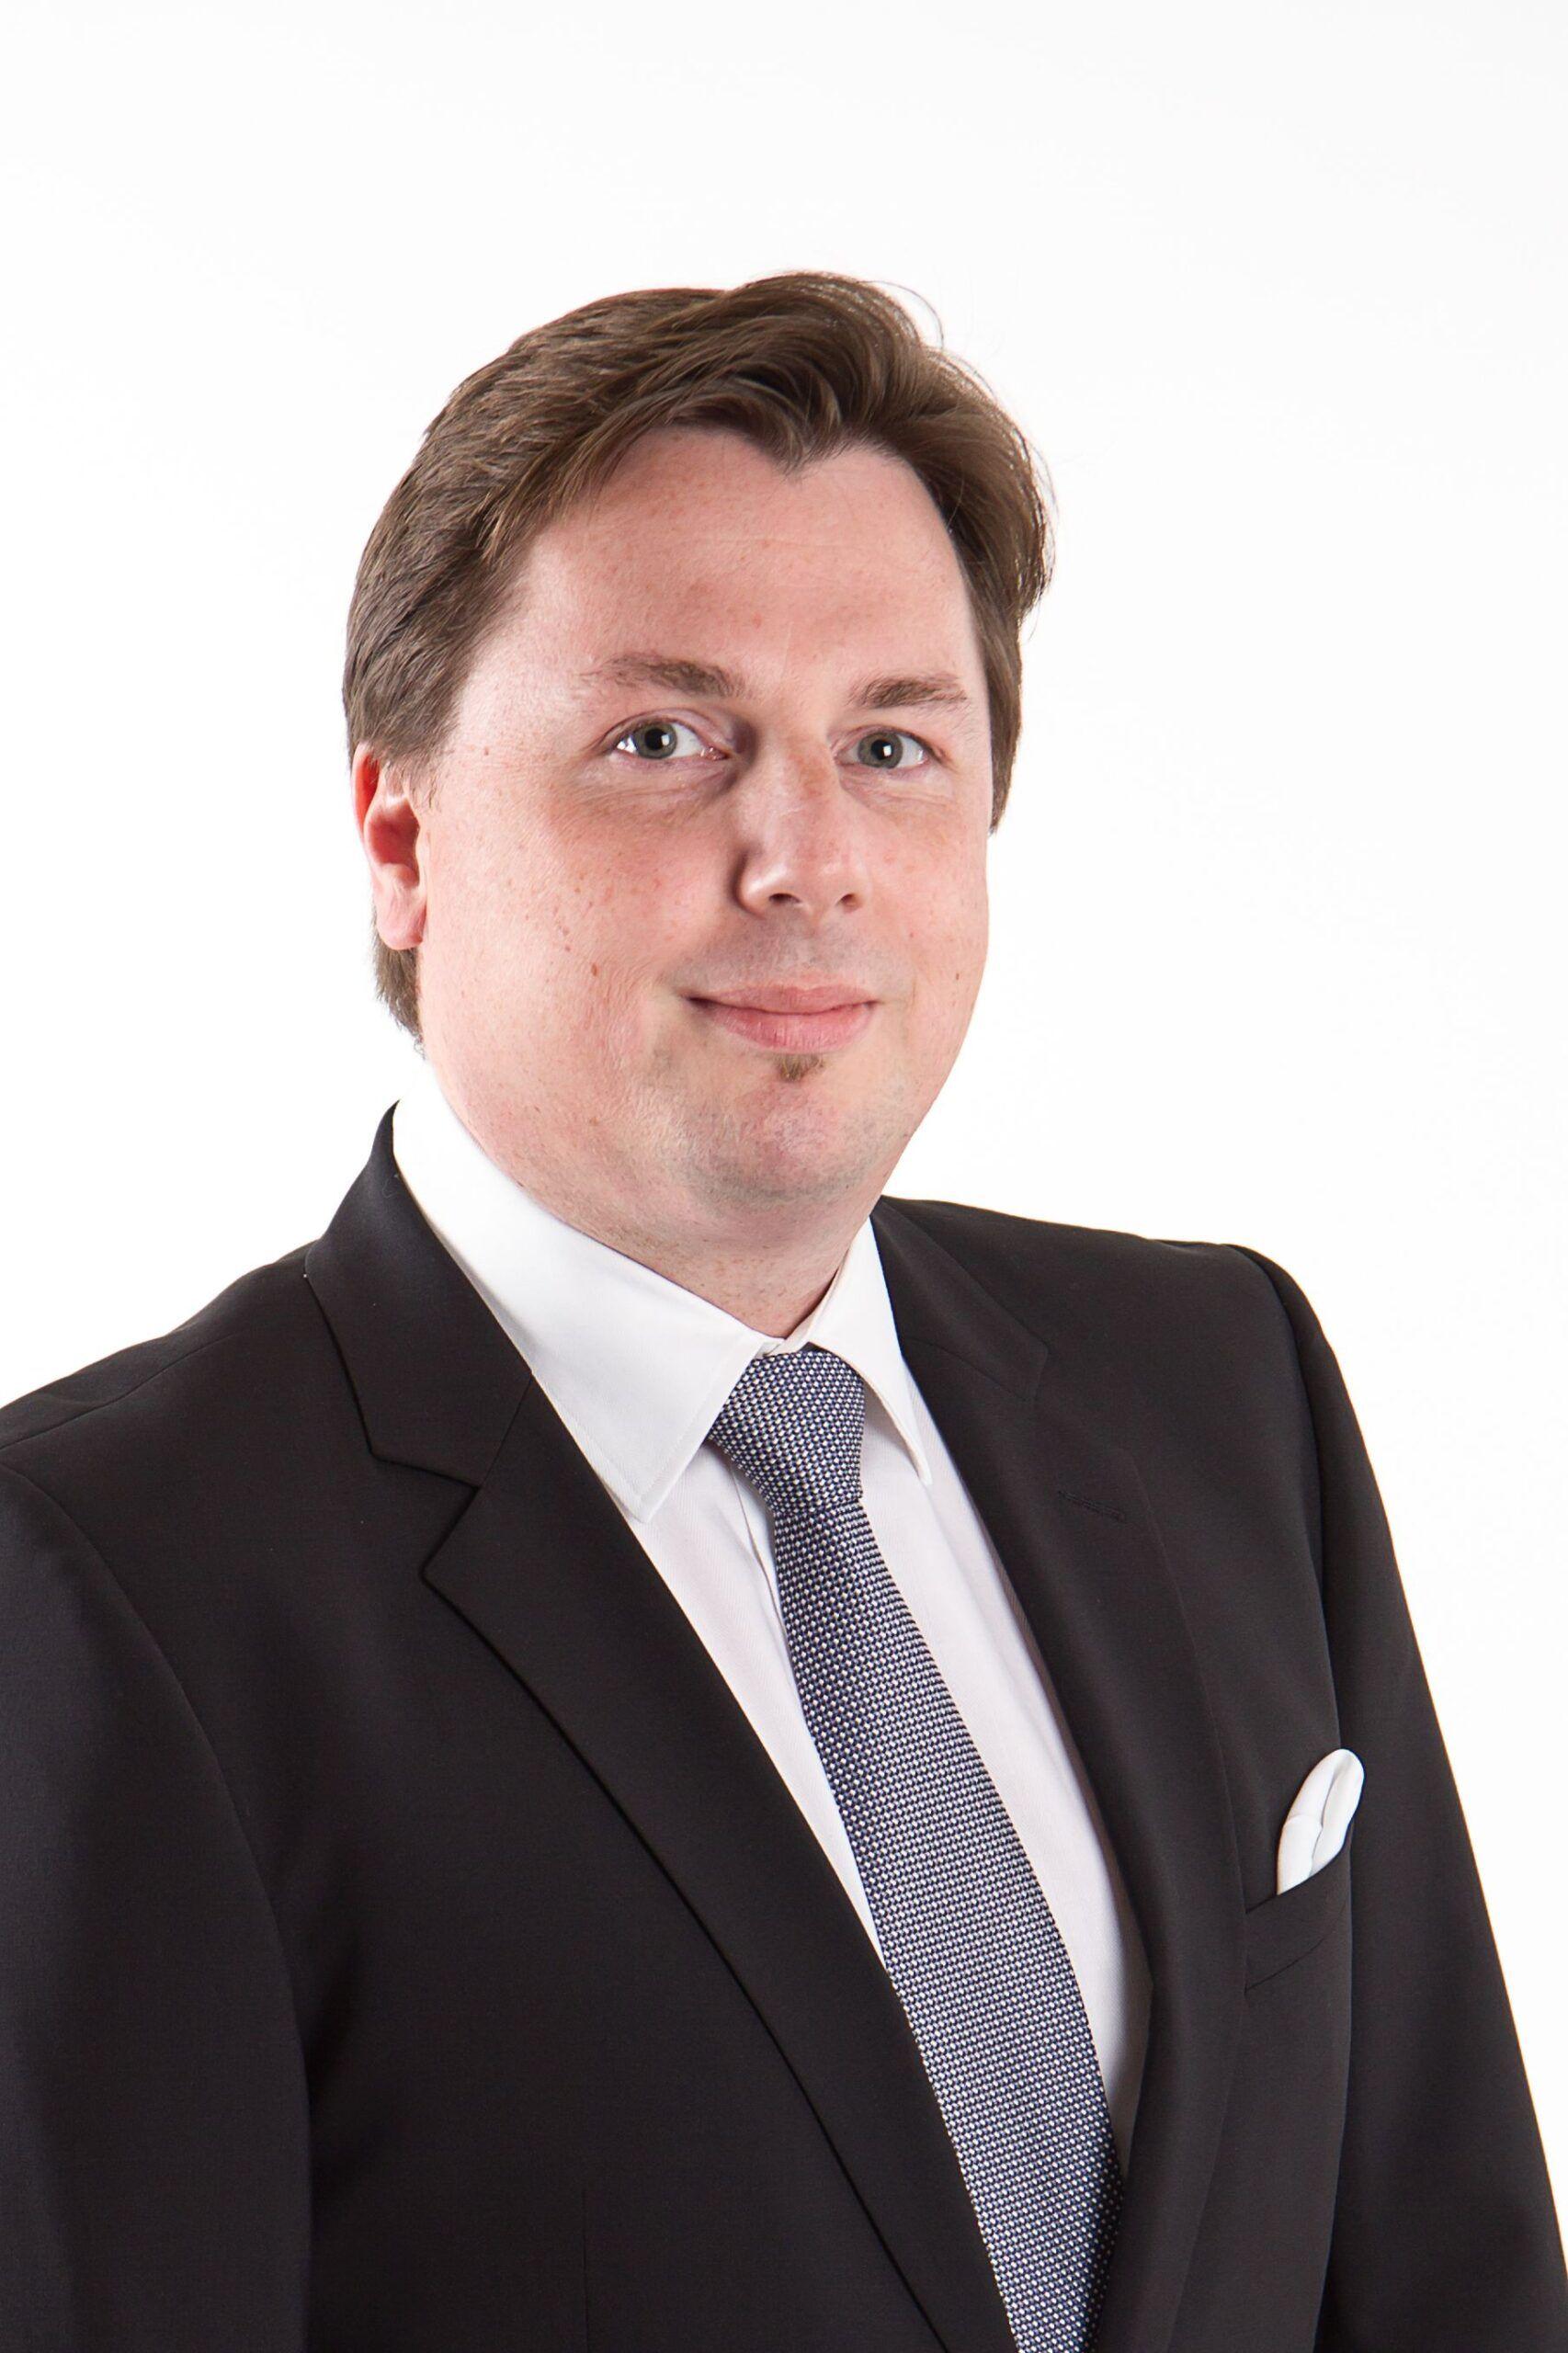 Manfred Zöhrer, CIIA